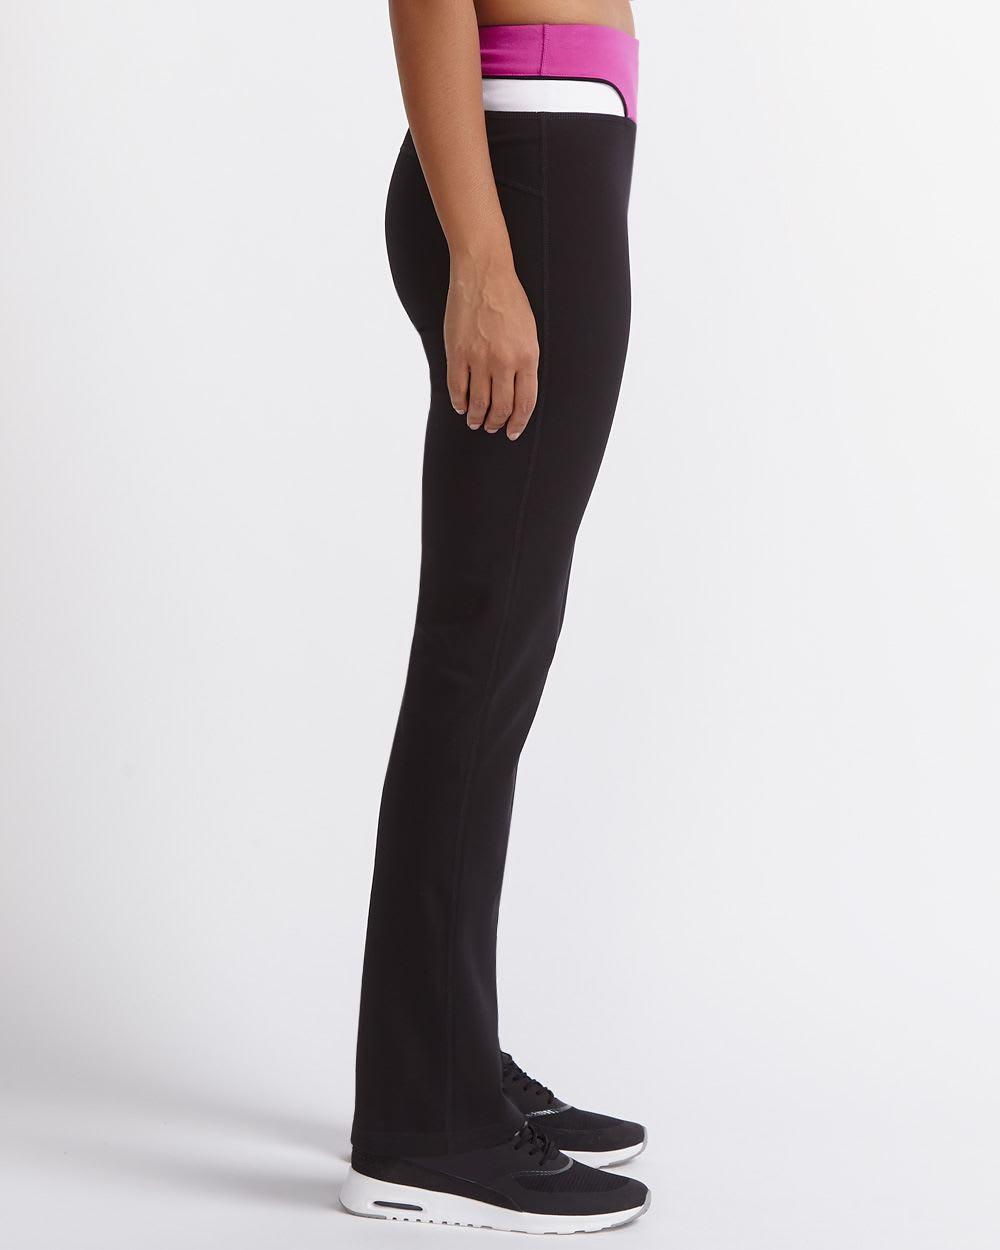 Hyba Petite Colourblock Pants